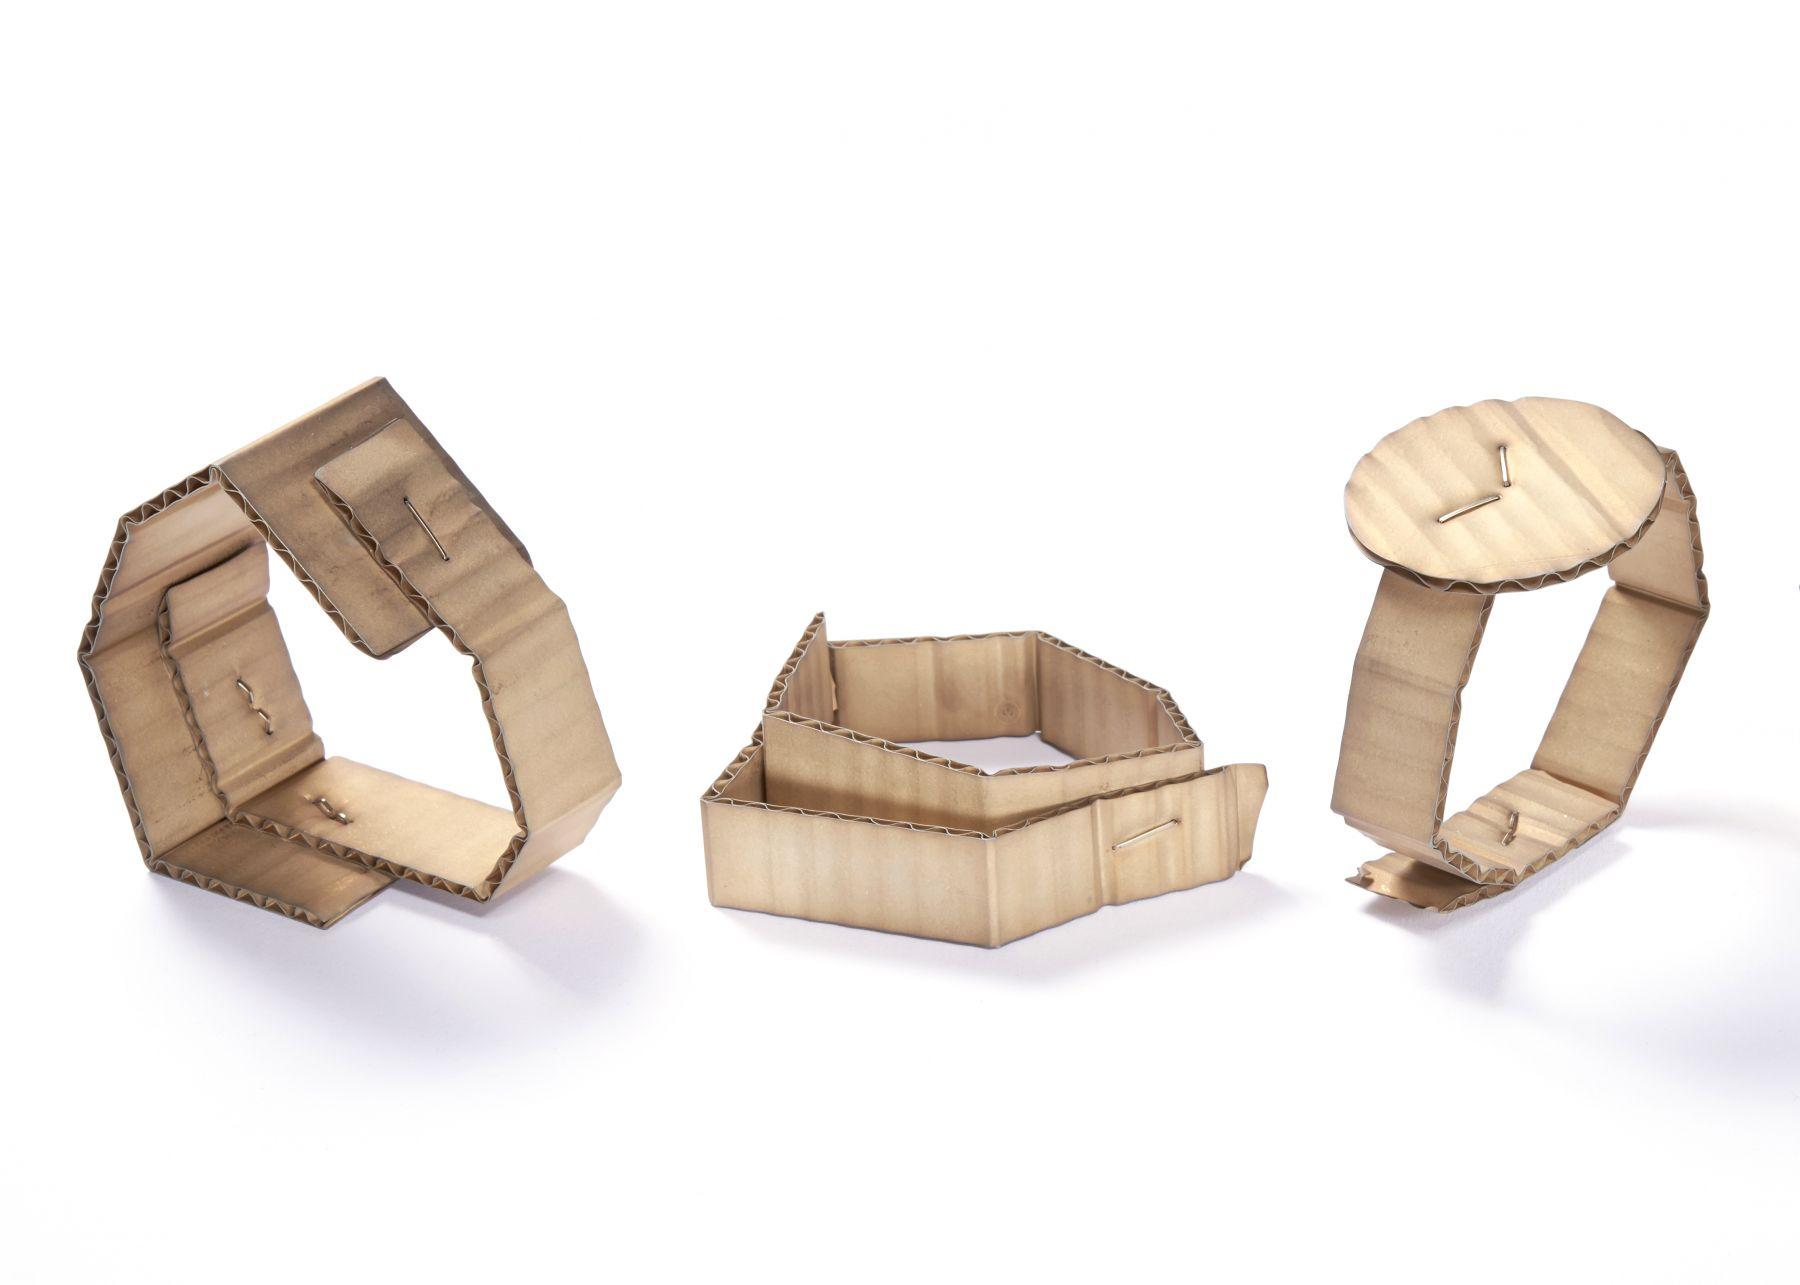 David Bielander Cardboard bracelets